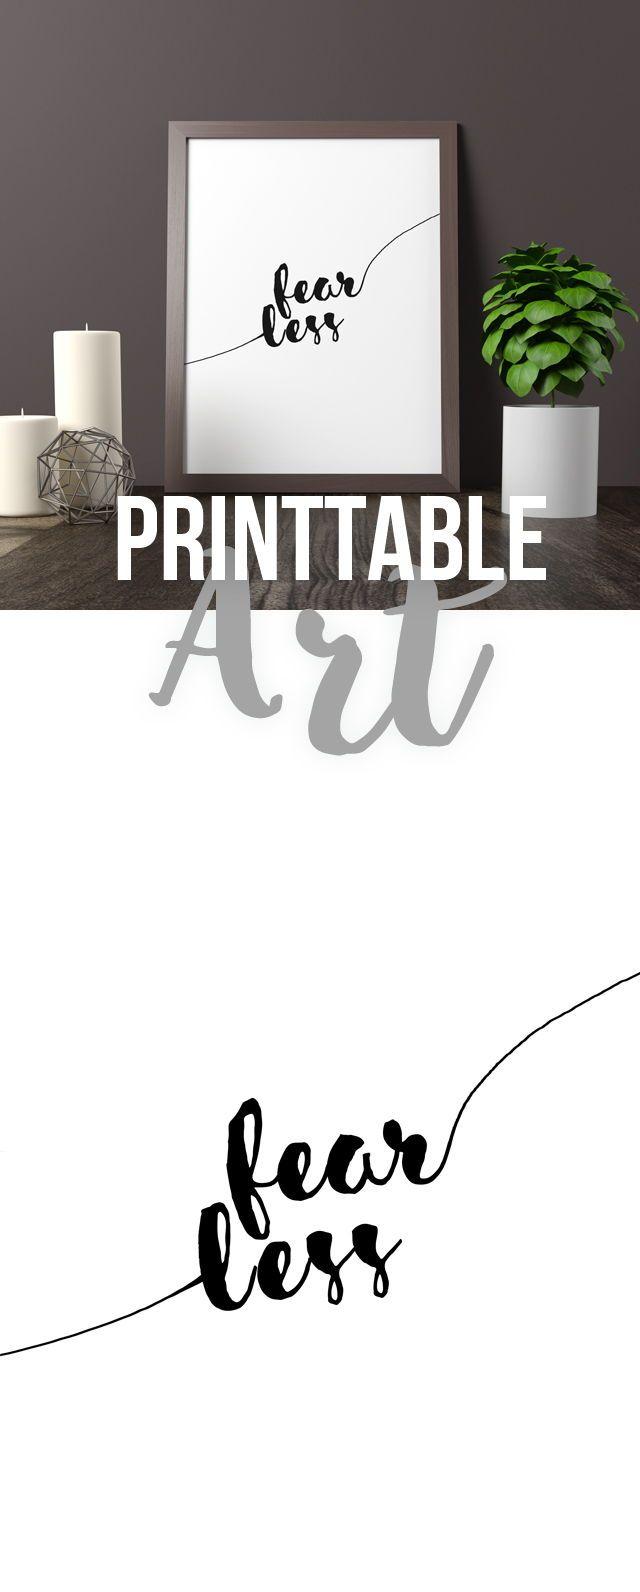 Printable Art Fearless